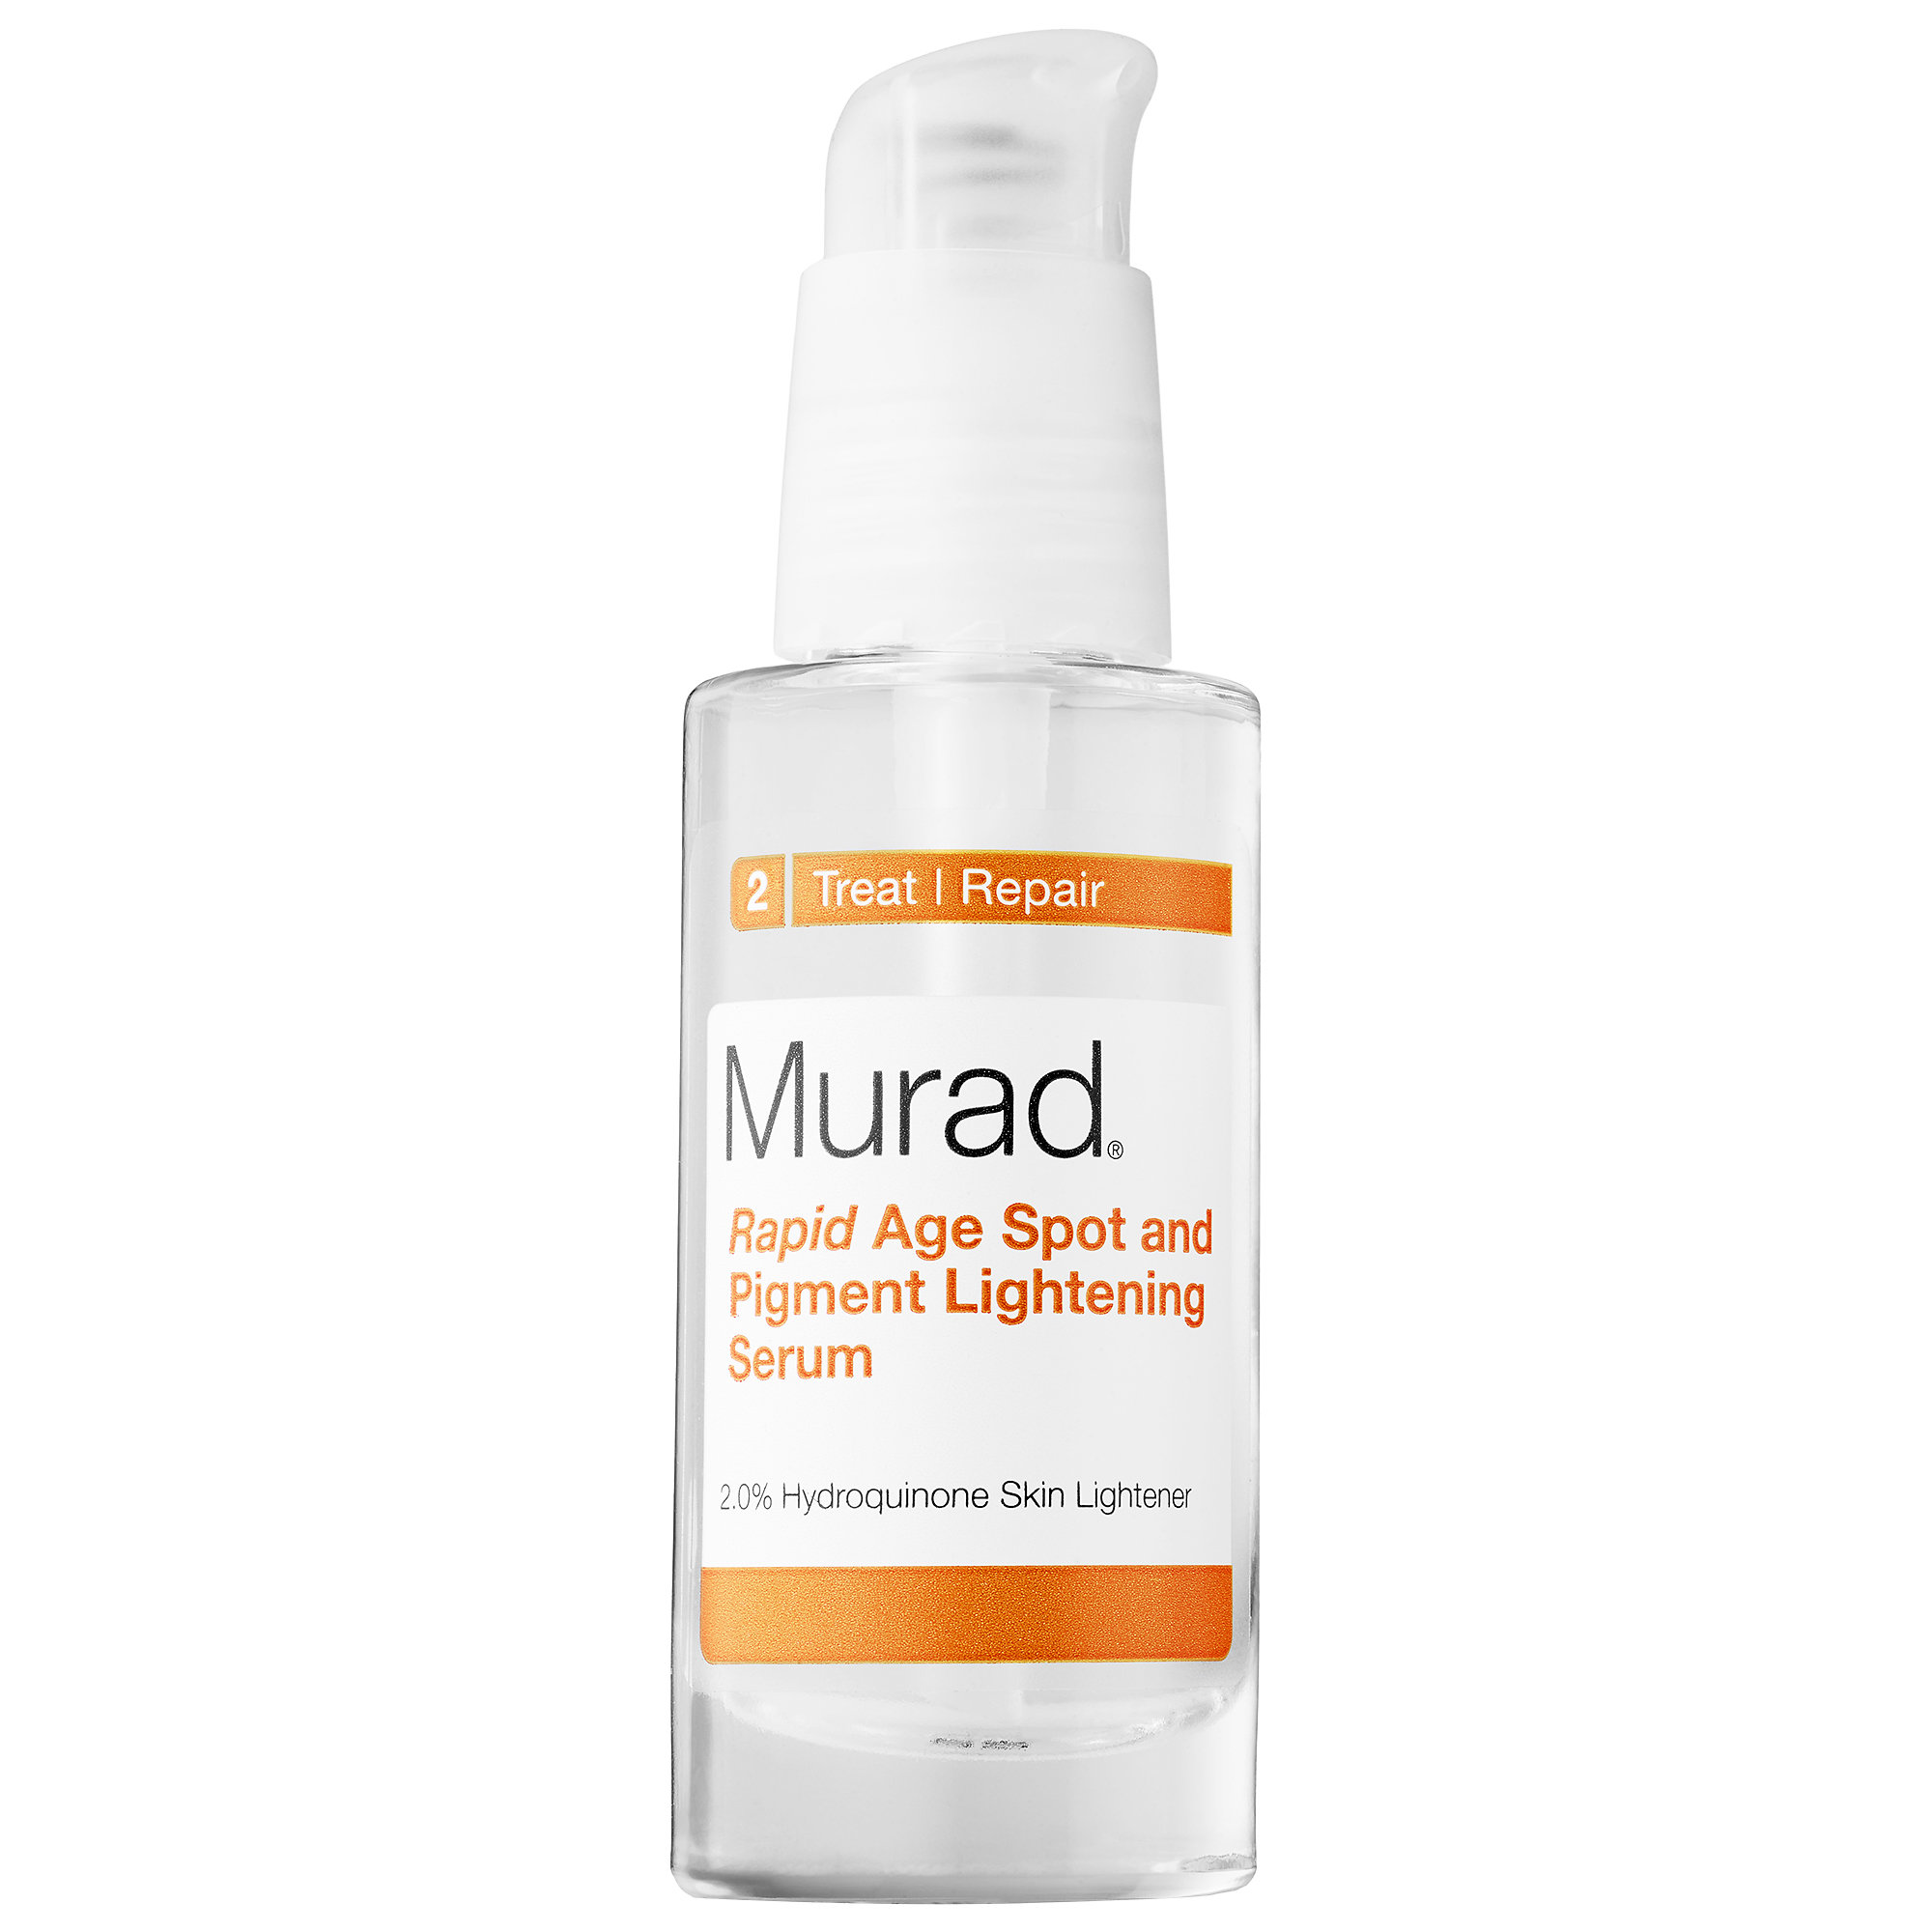 Murad Rapid Age Spot Serum, $60